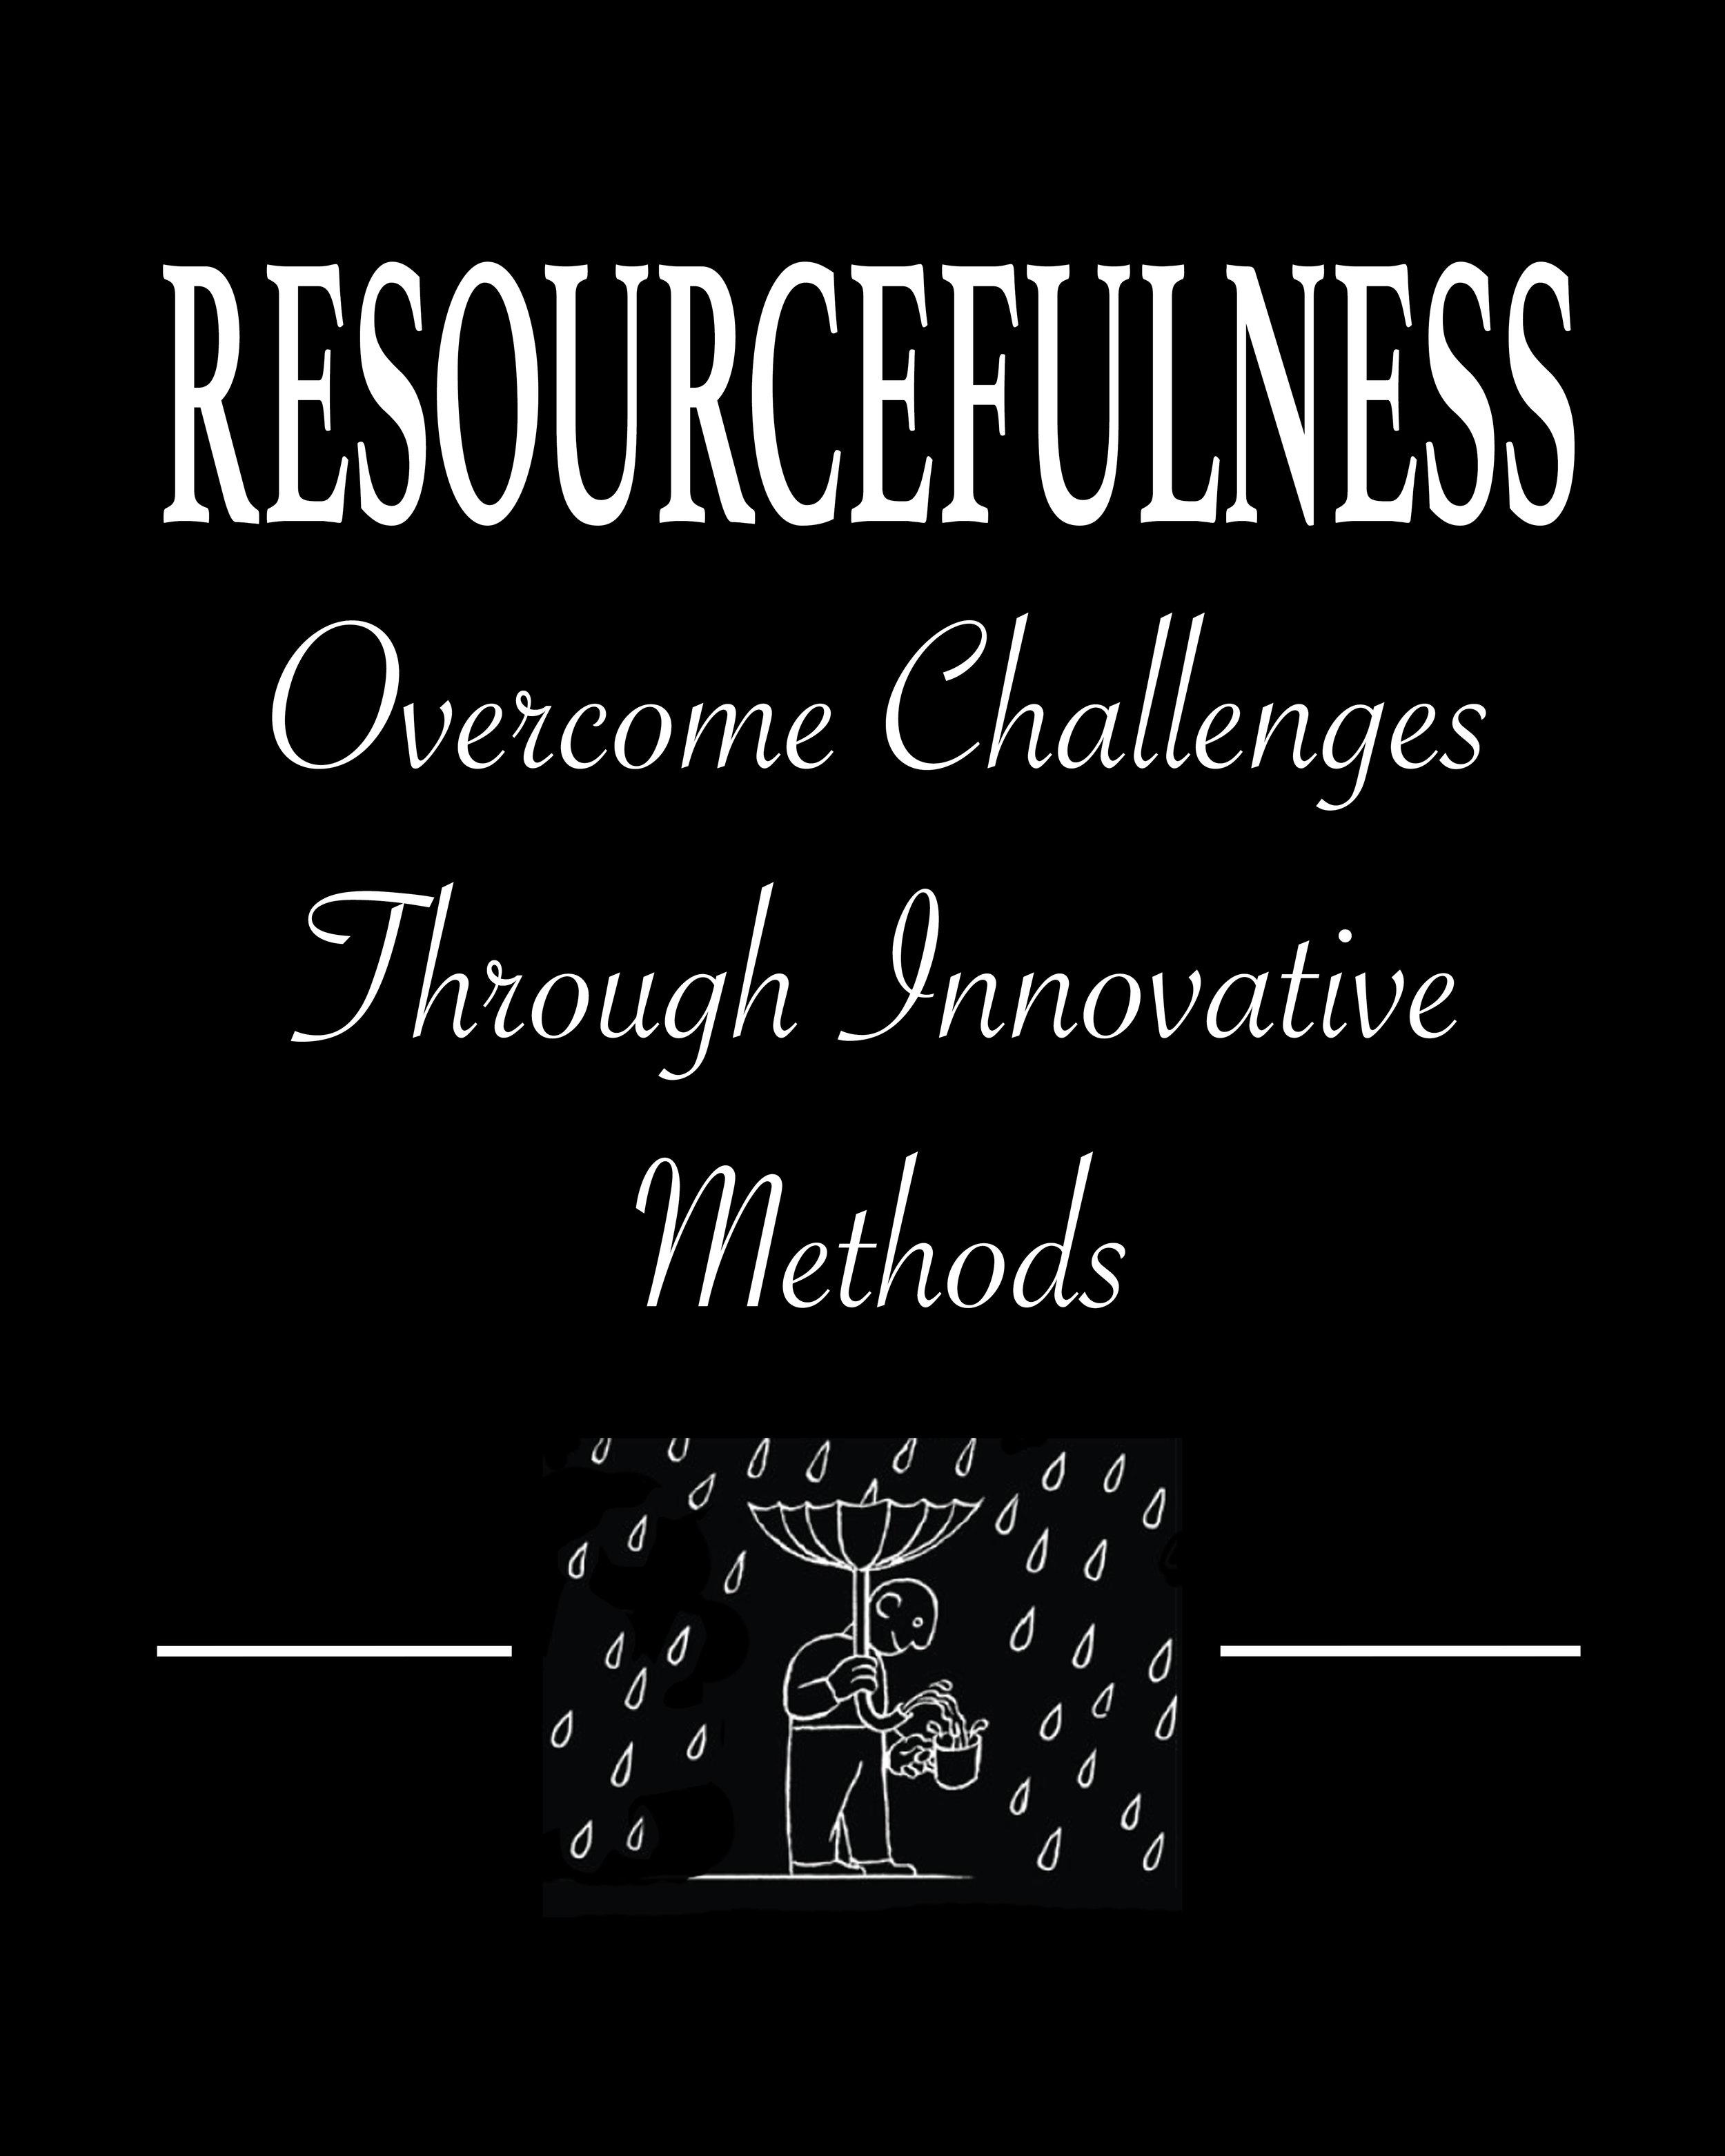 07 Resourcefullness.jpg